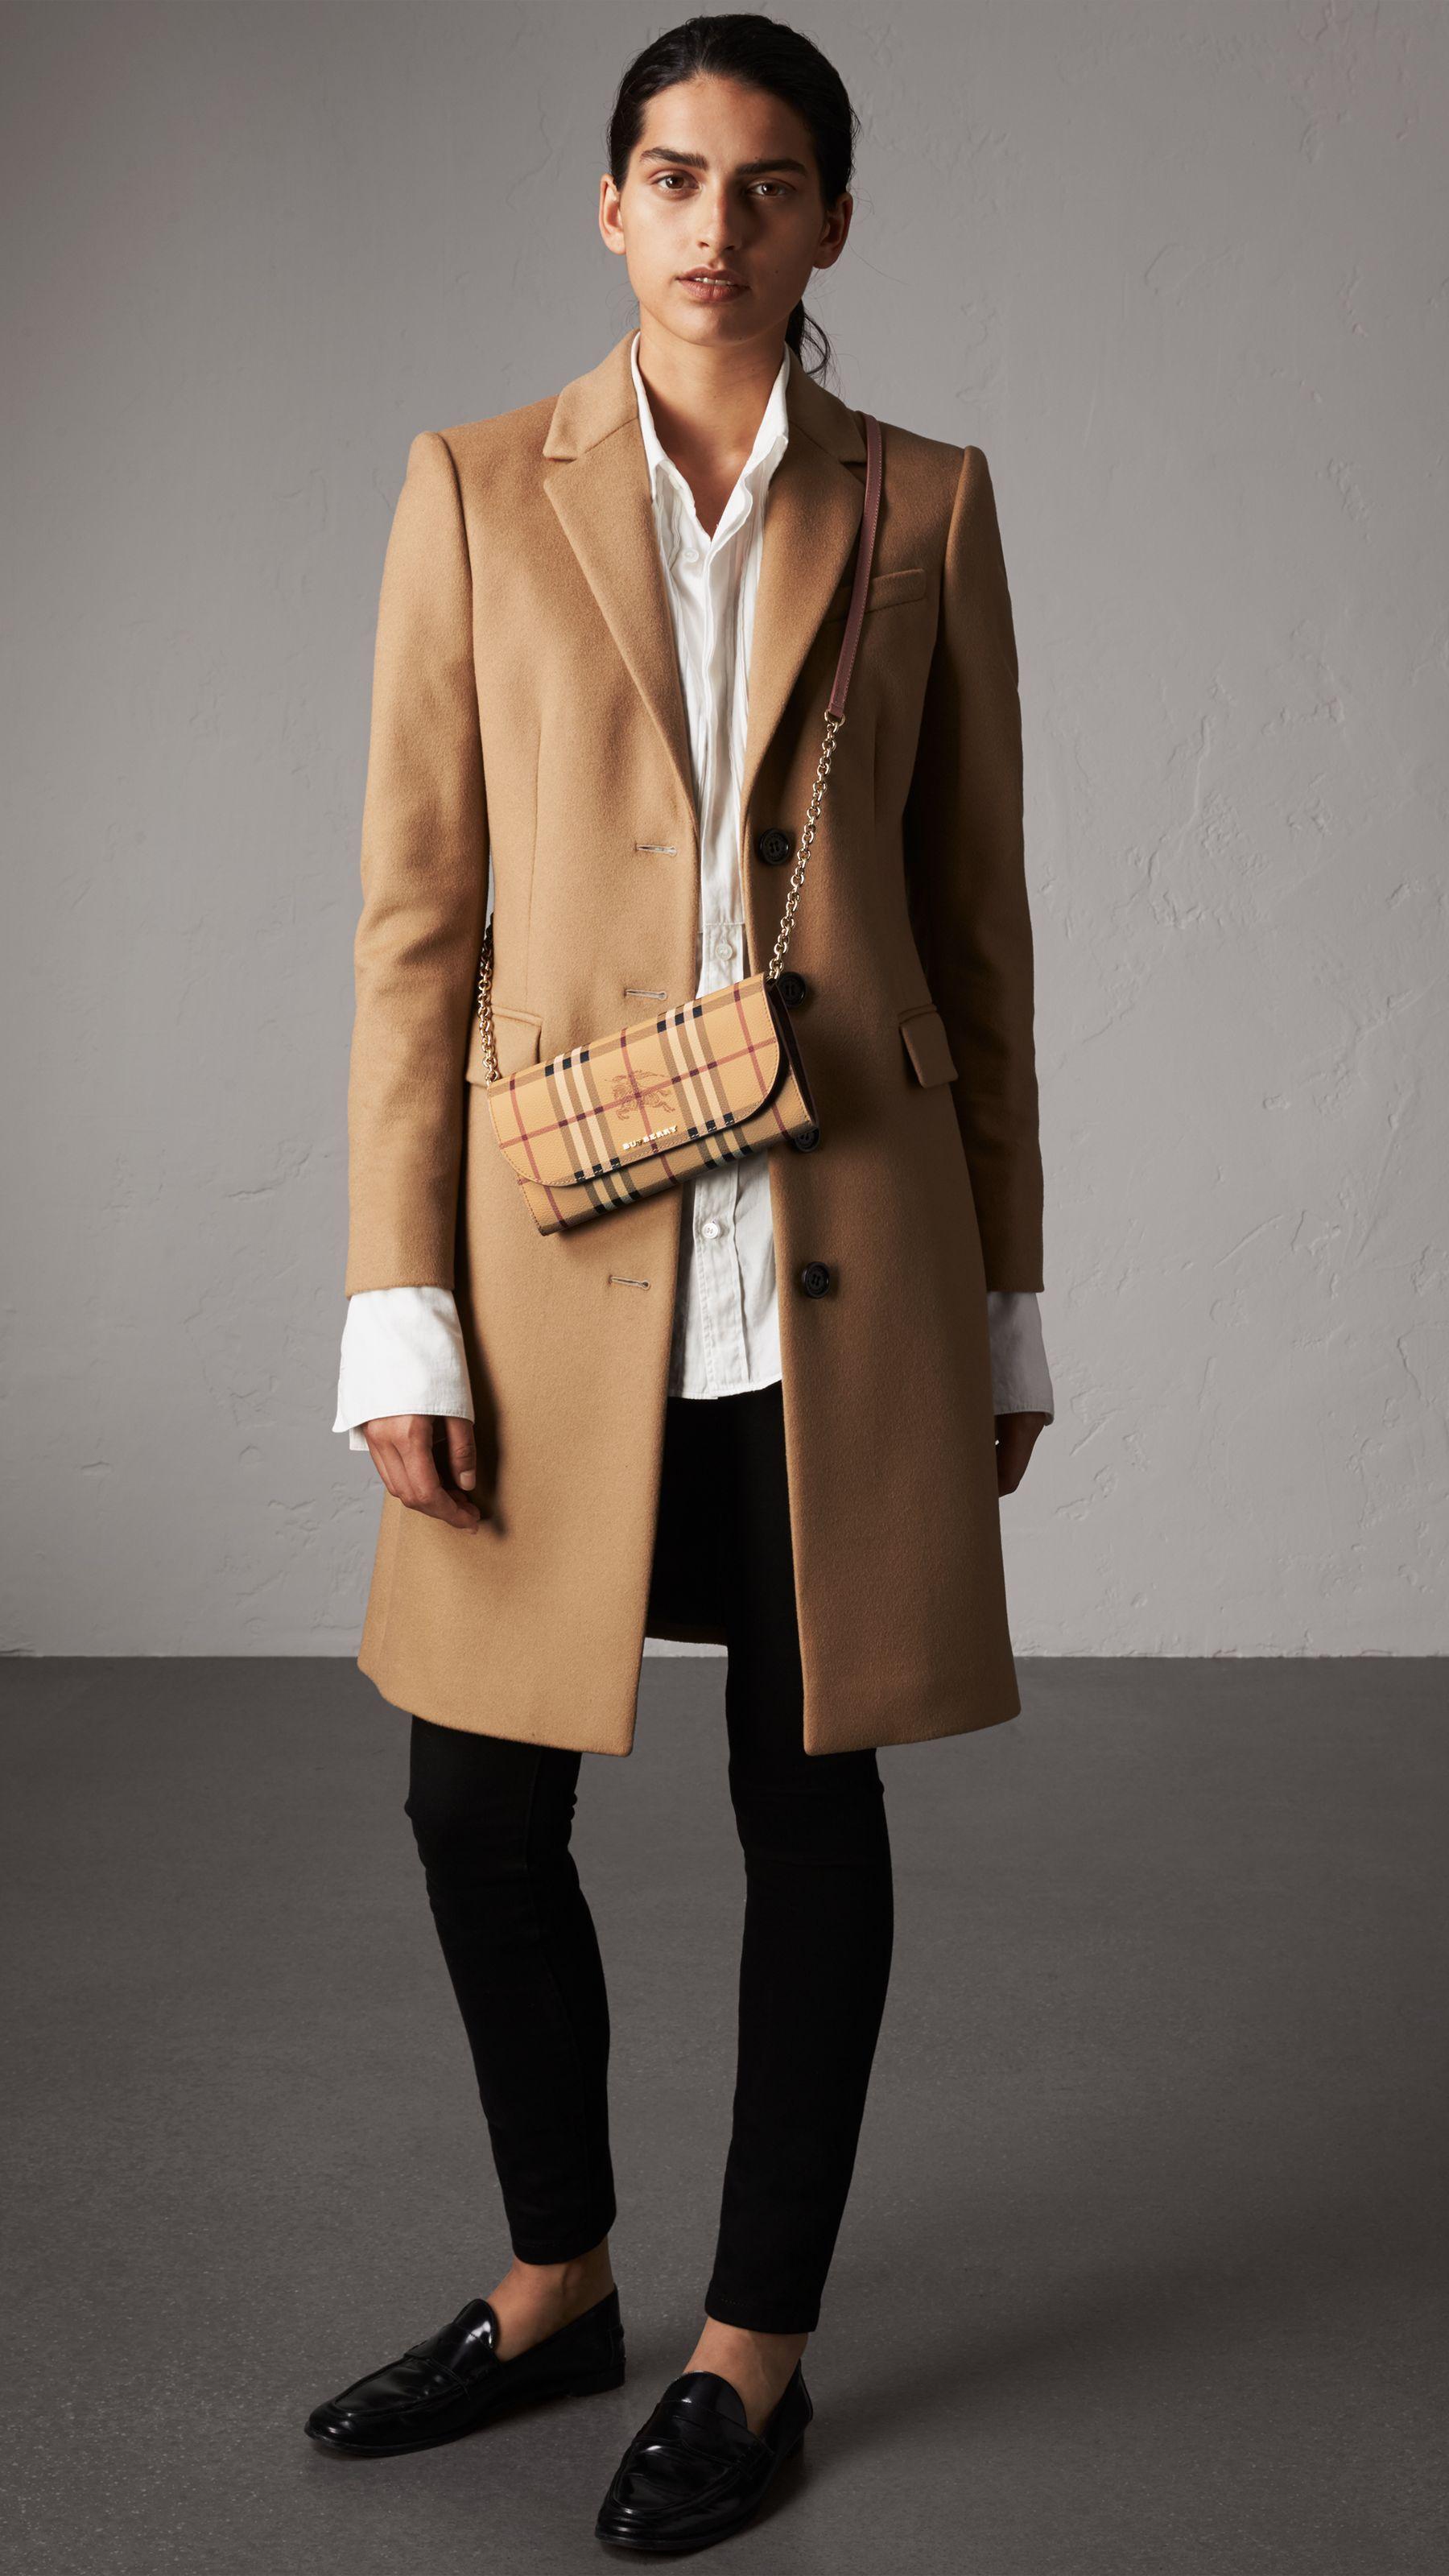 06d001922b21 Leather Trim Haymarket Check Wallet with Chain in Light Elderberry - Women